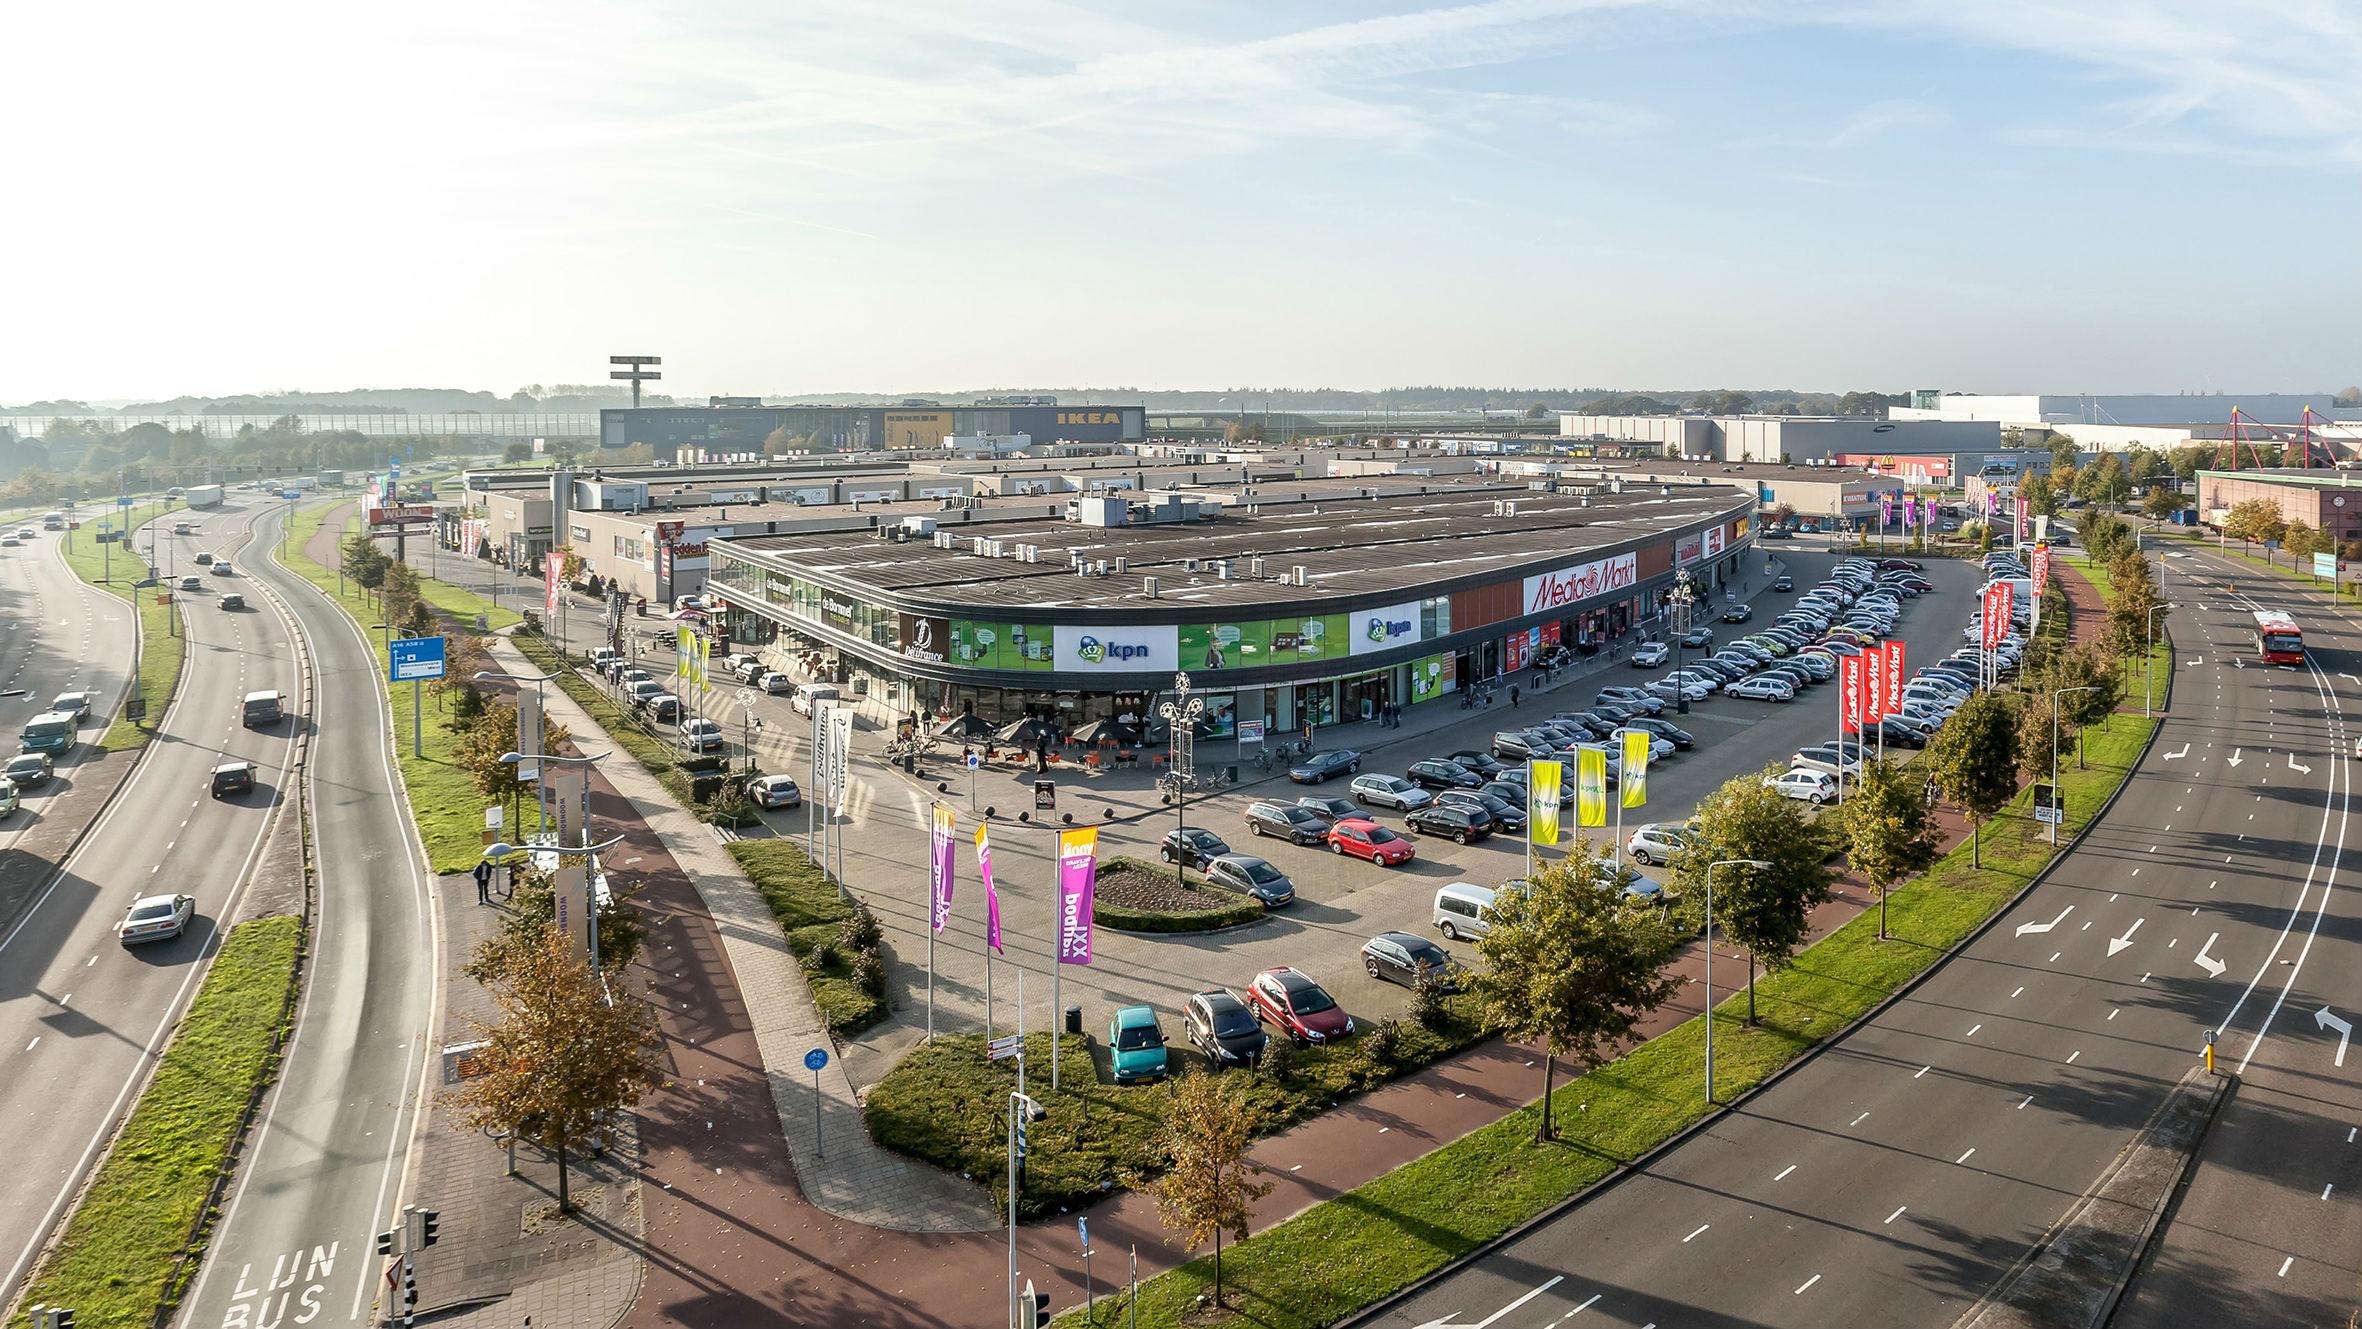 Riviu00e9ra Maison naar Woonboulevard Breda - Vastgoedmarkt